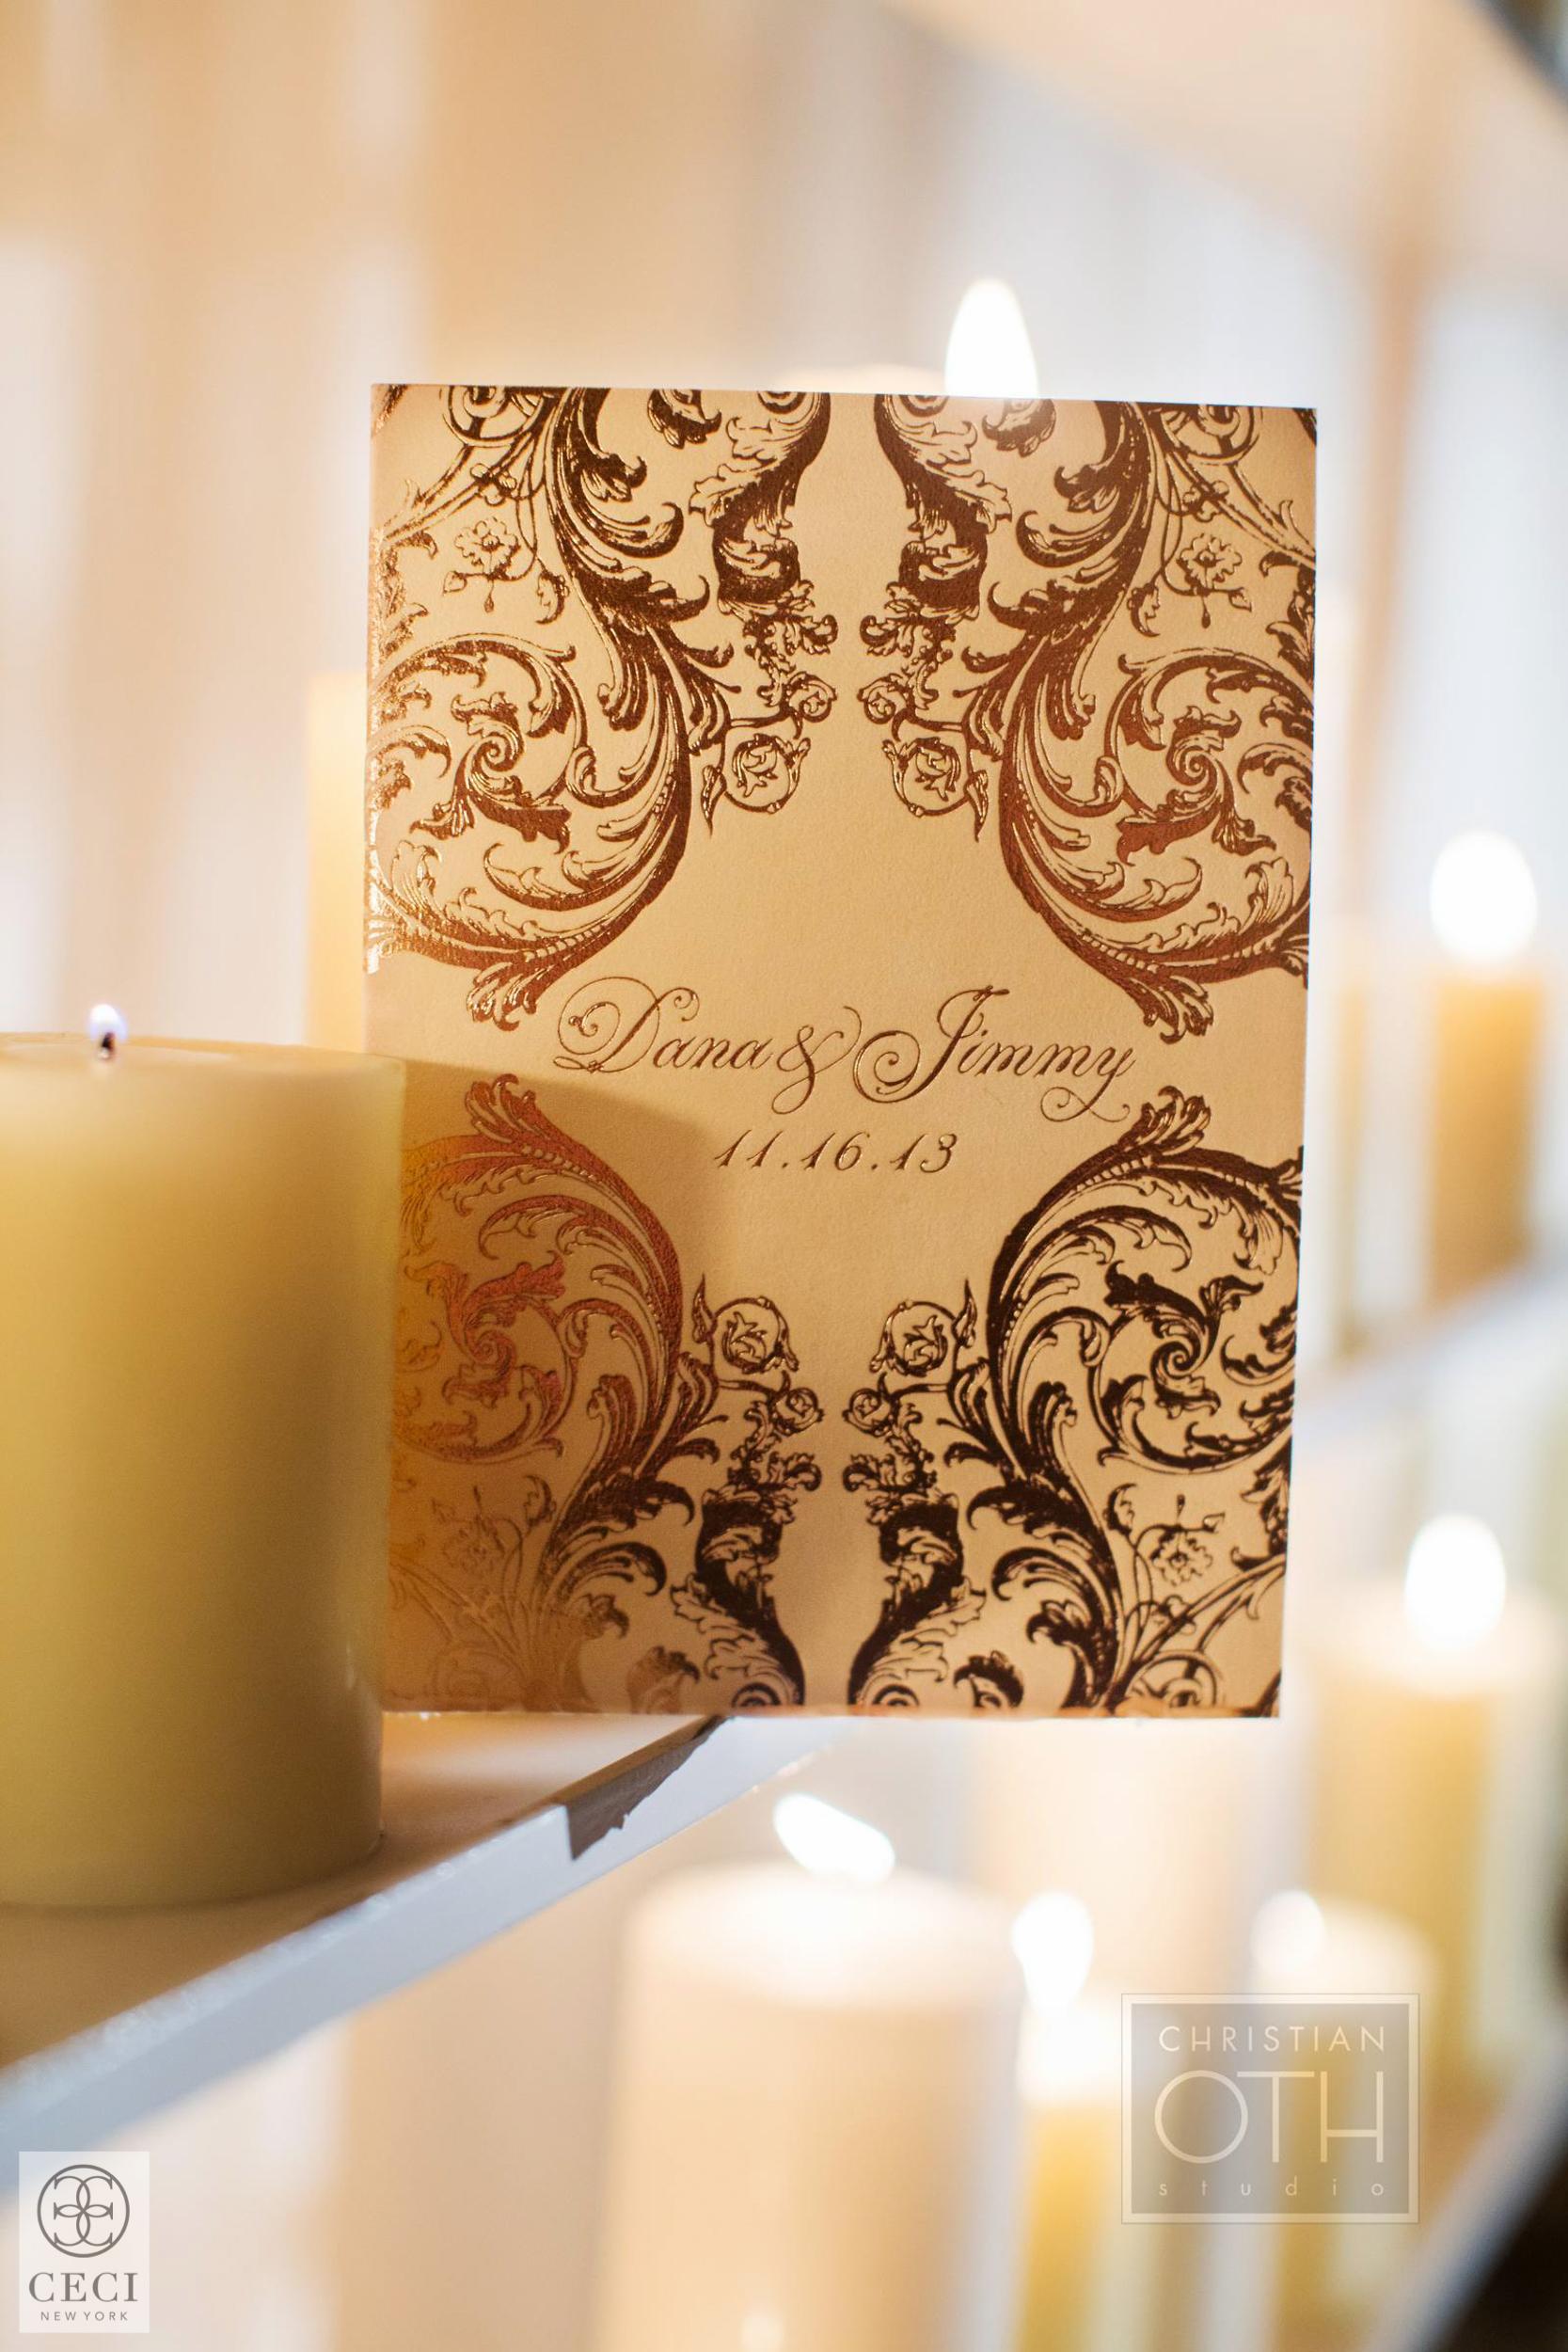 Ceci_New_York_Christian_Oth_CeciStyle_Pierre_New_York_City_Wedding_Luxury_Custom_Invitations_Personalized_Rose_Gold_Blush_Bride_-5.jpg